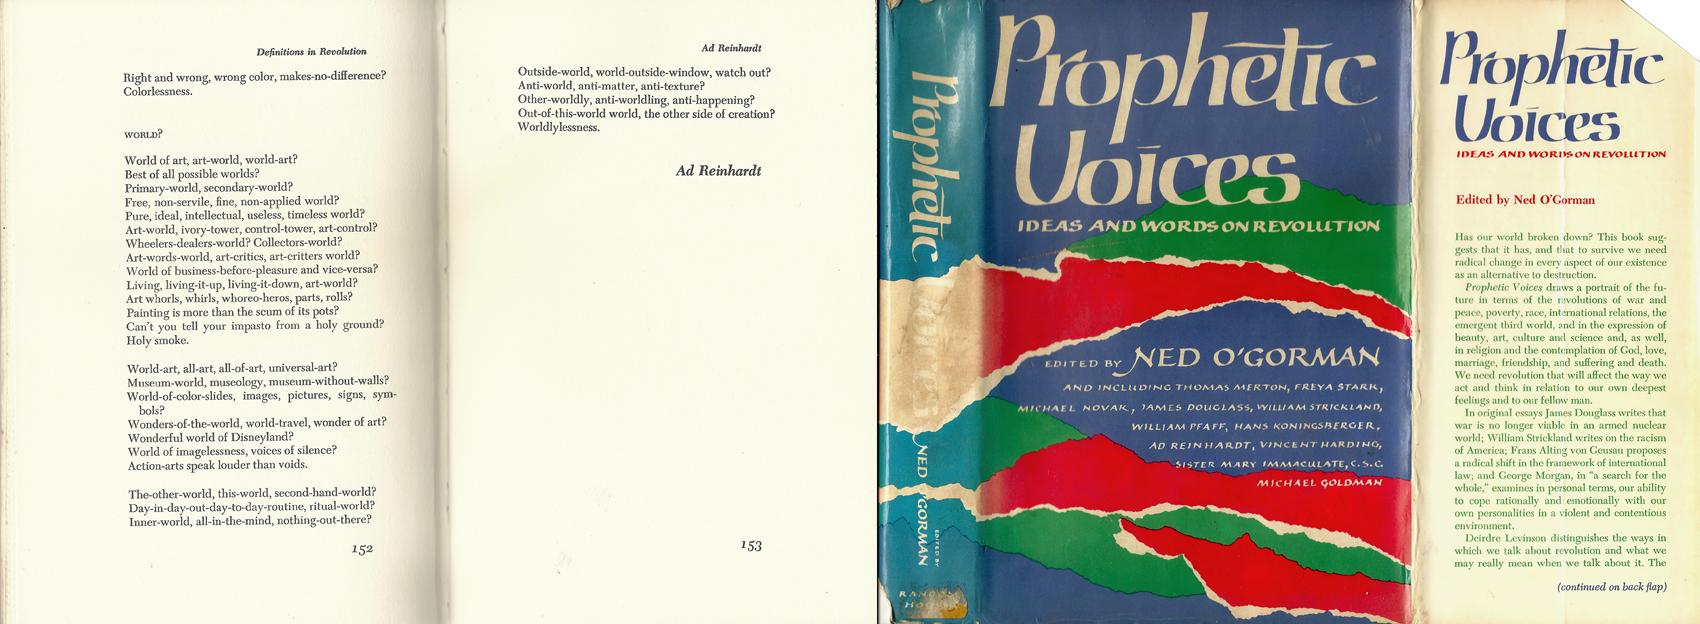 Reinhardt Prophetic Voices